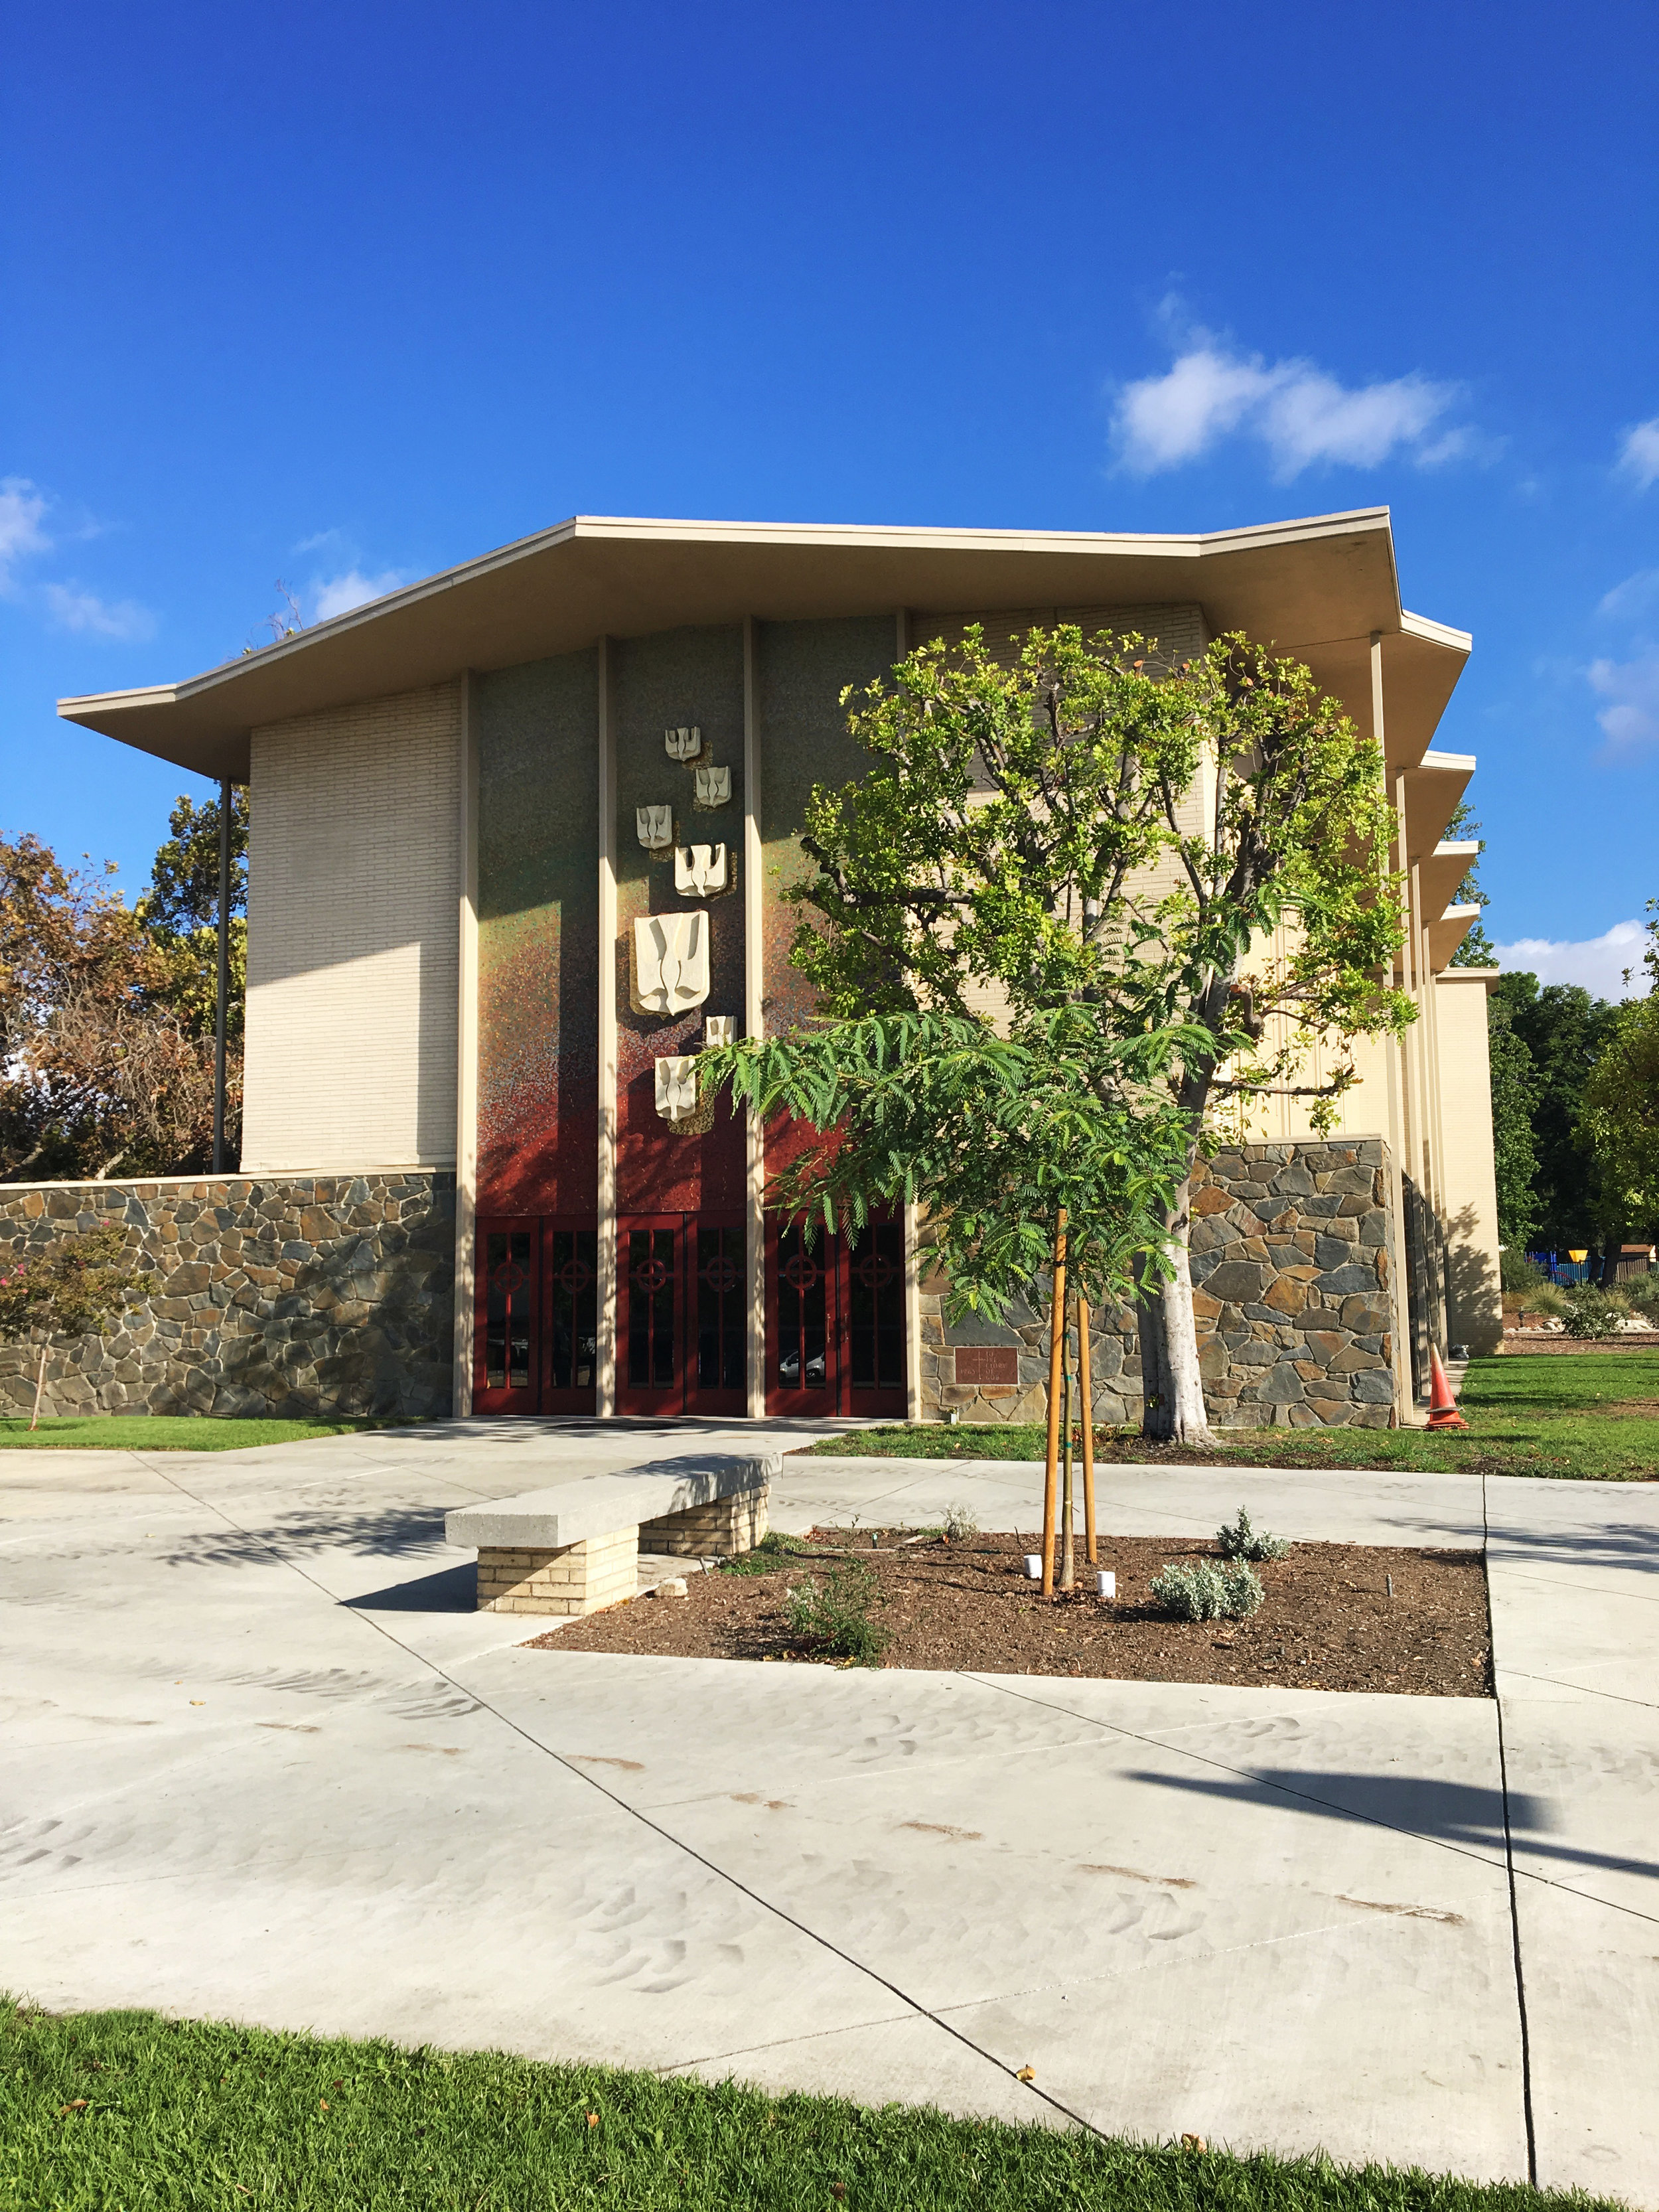 claremont-presbyterian-church-campus-tour-sanctuary-2.jpg